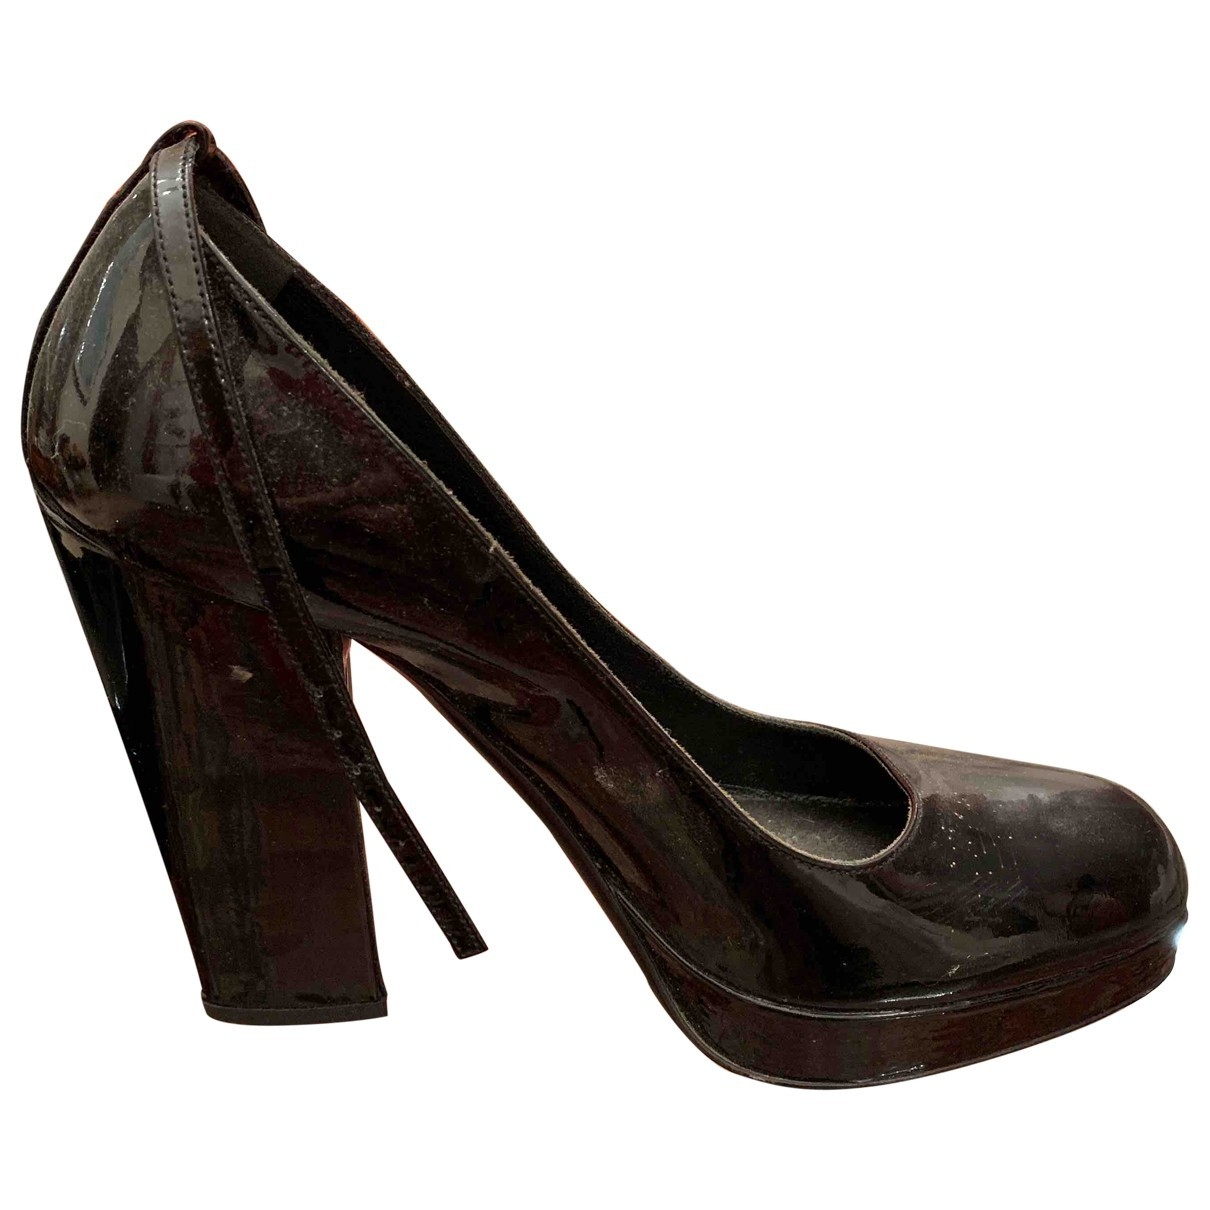 Prada \N Black Patent leather Heels for Women 39 EU